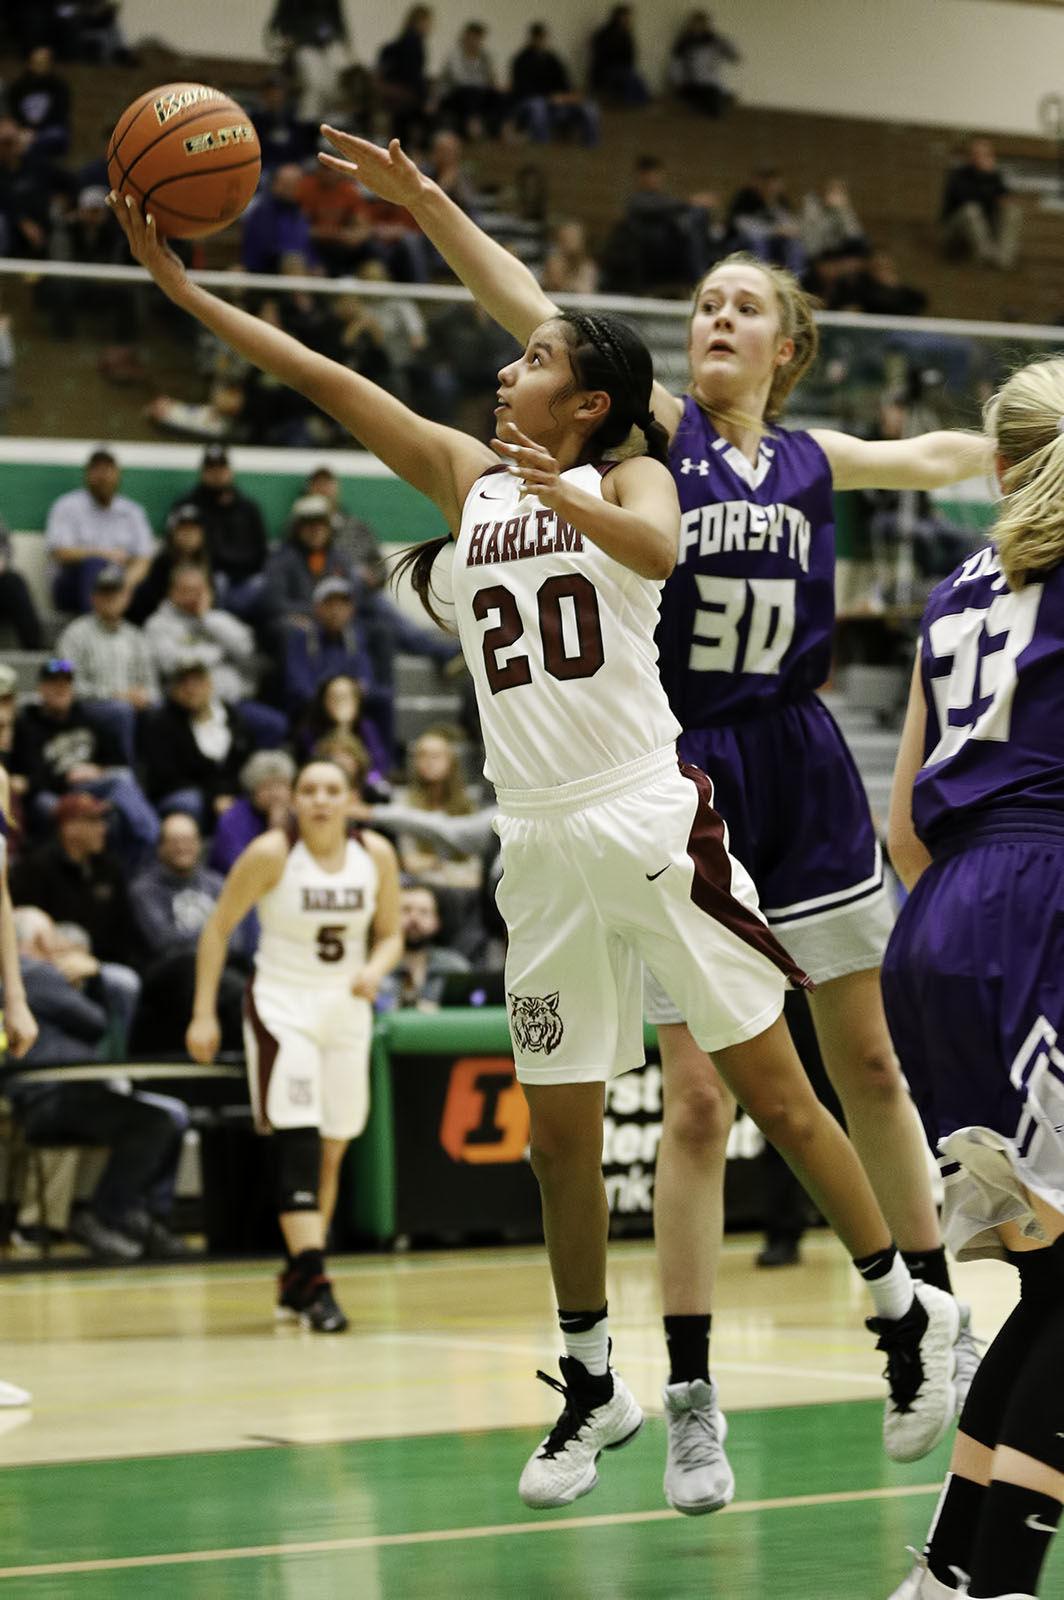 State B girls basketball: Harlem vs. Forsyth